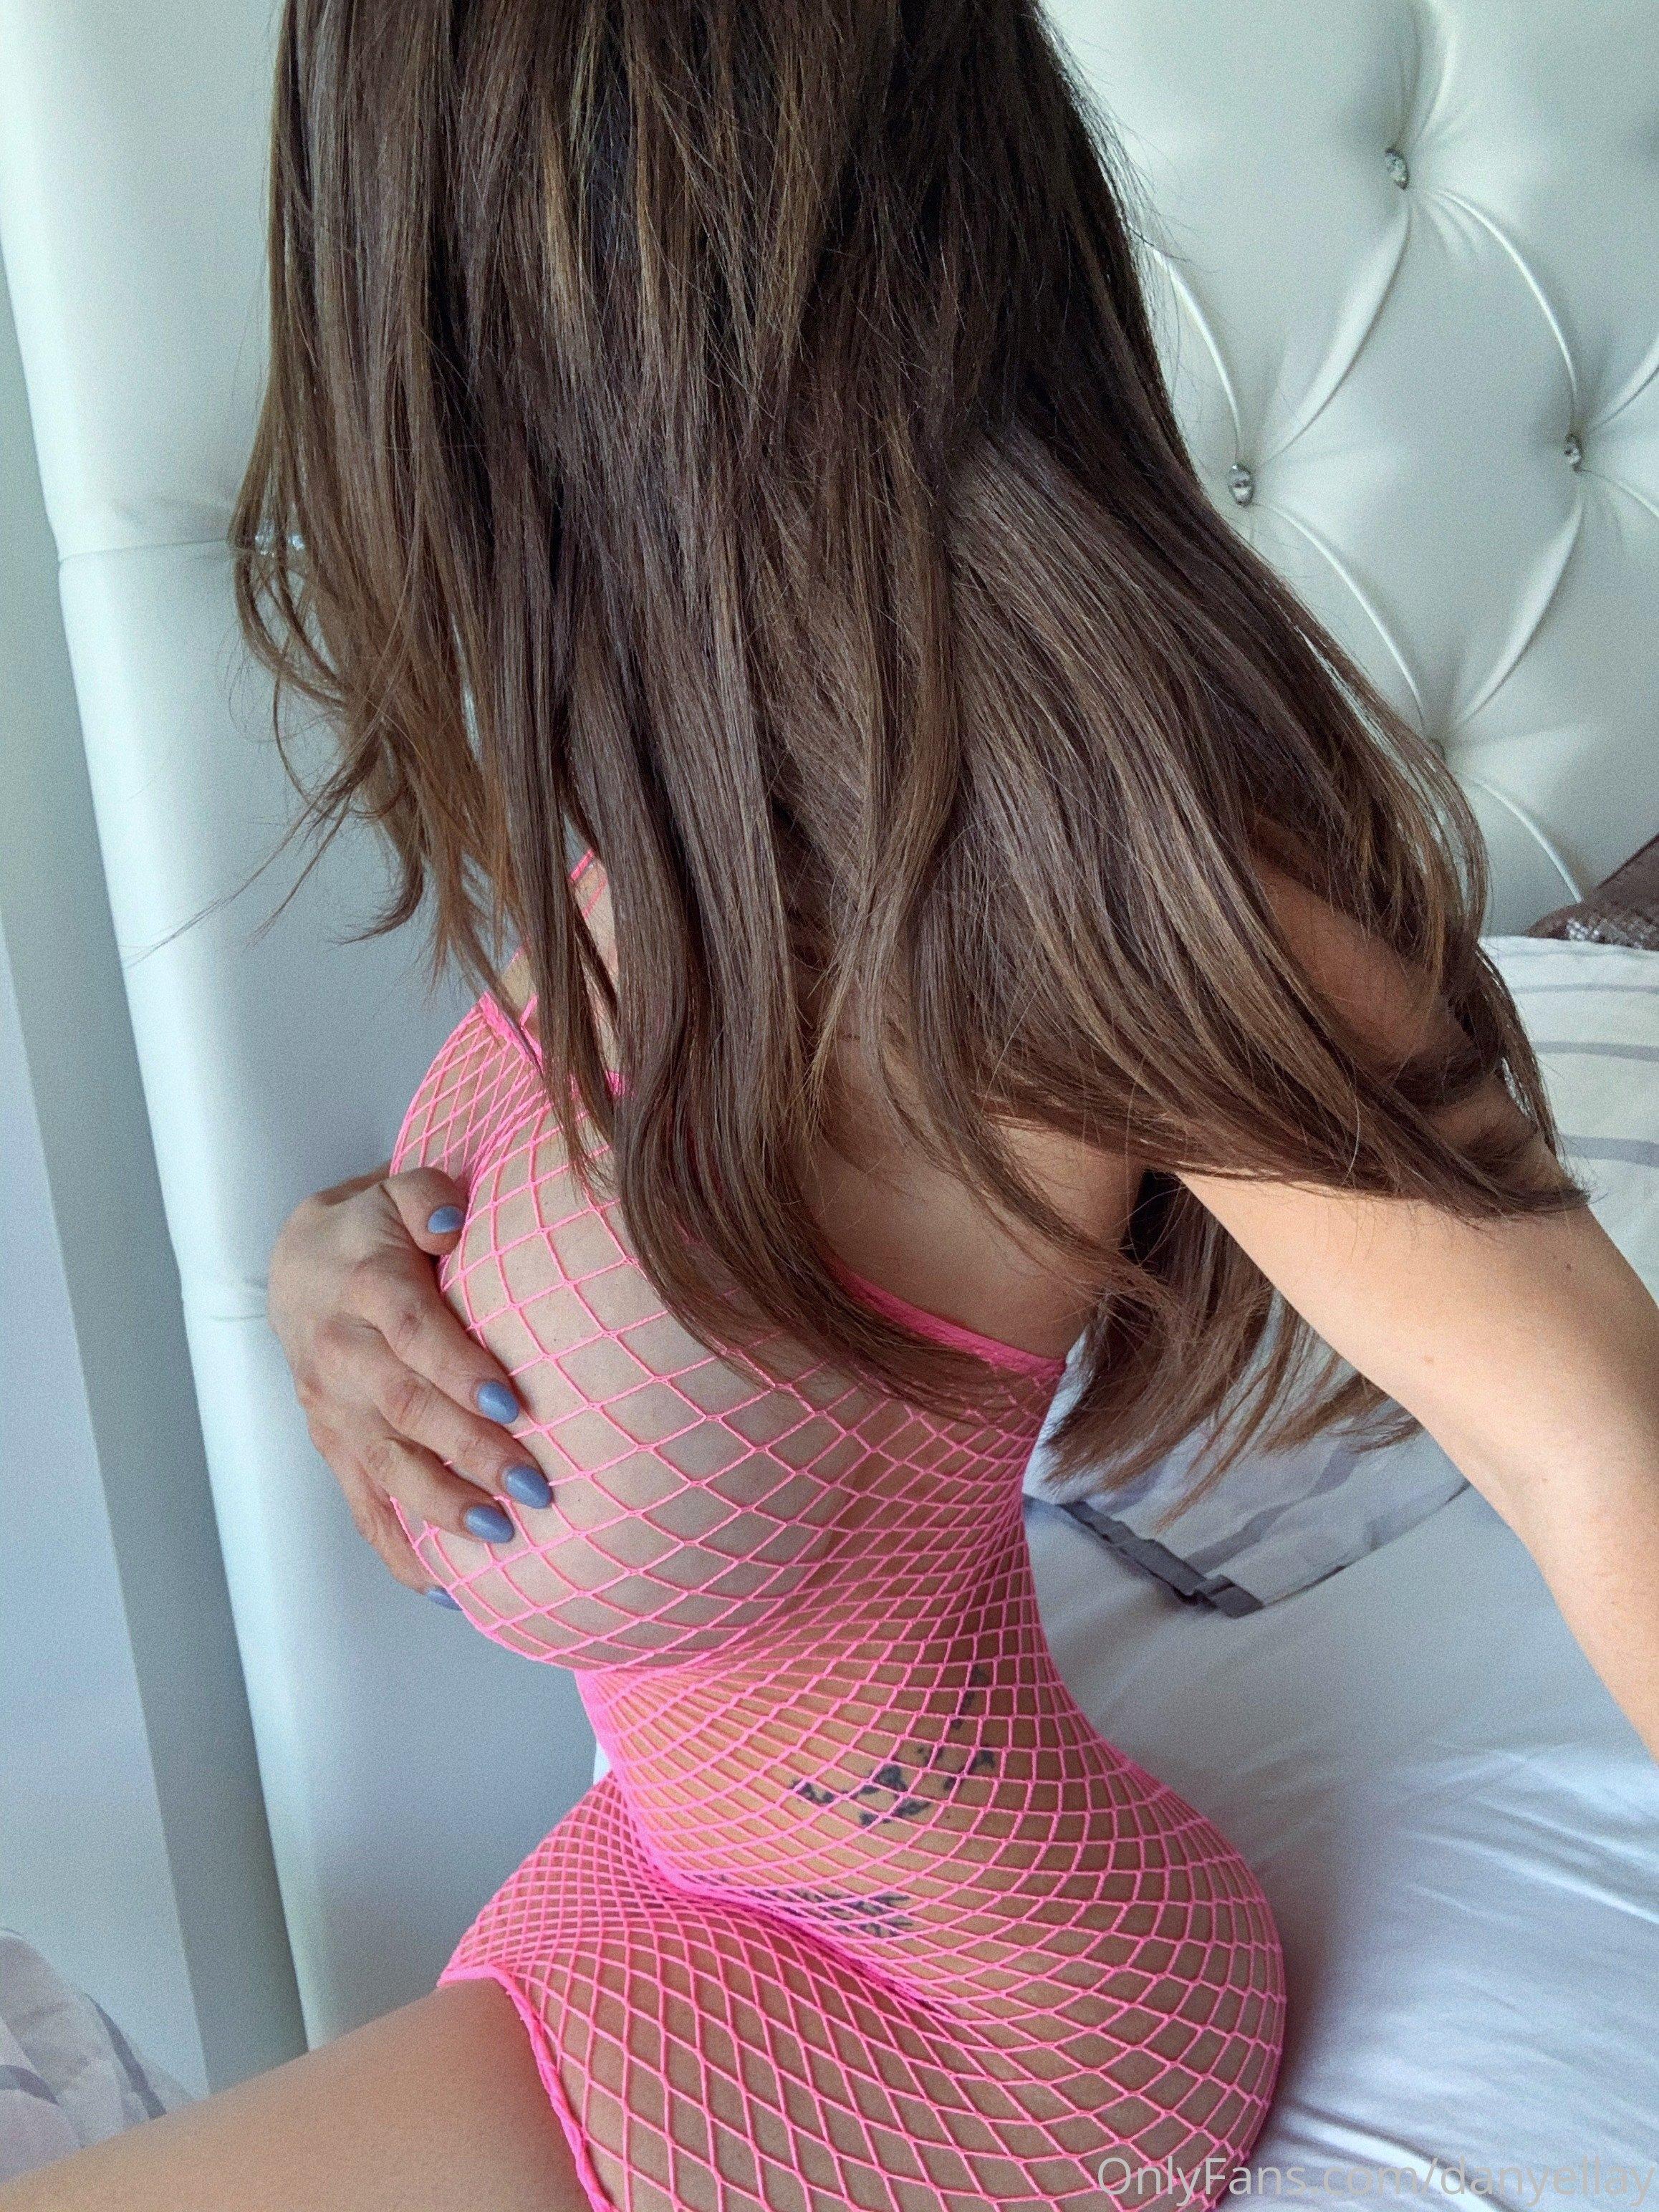 Danielley Ayala 0093